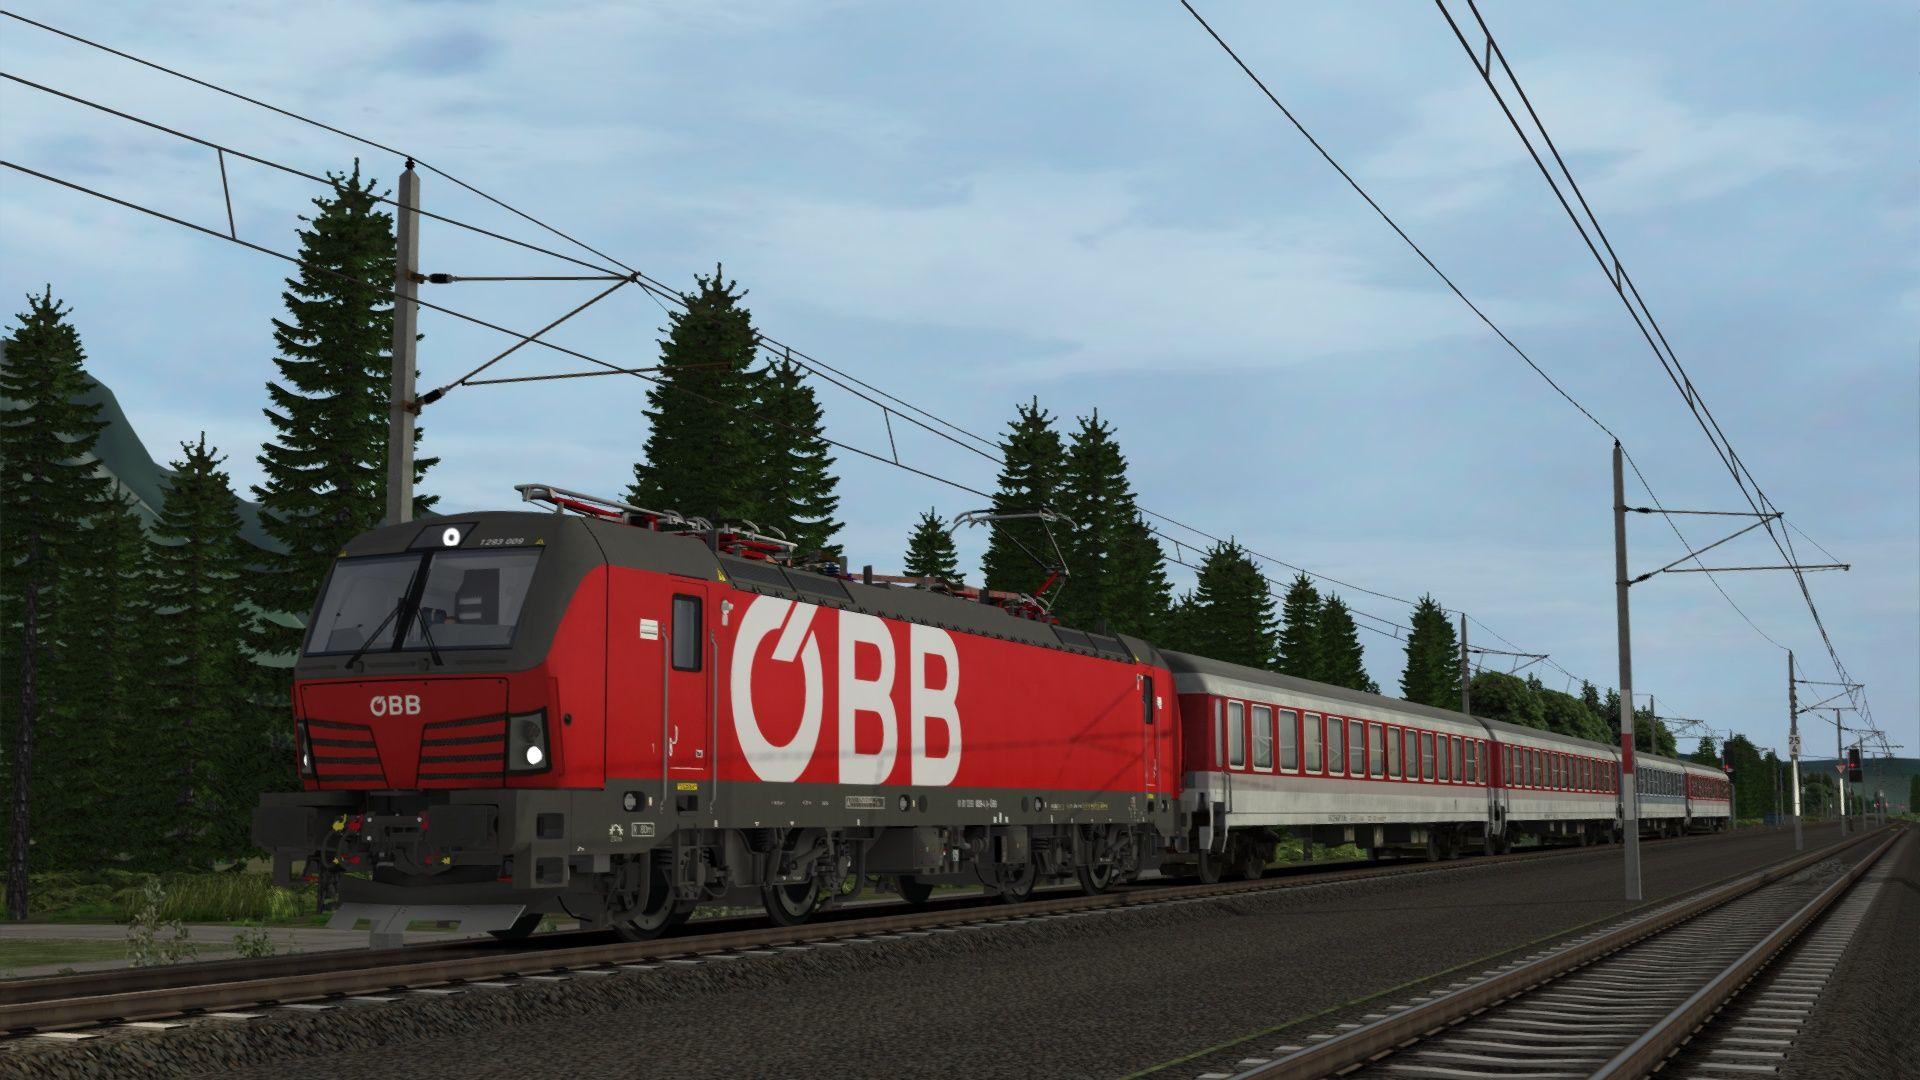 OBB12932